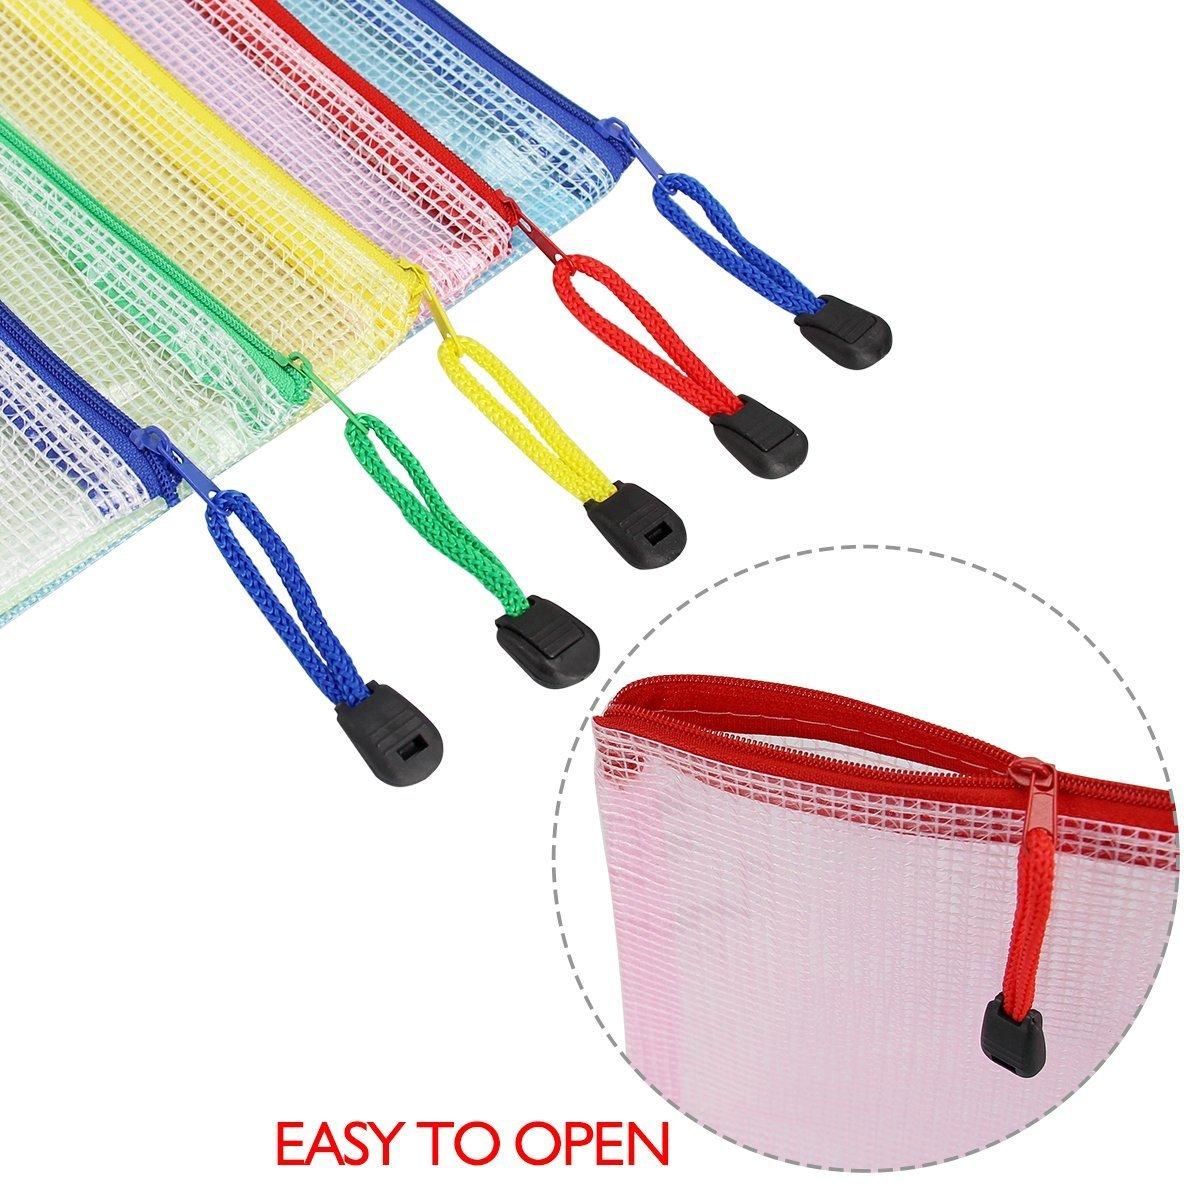 Rocita 12Pcs Zipper File Bags A4 Size Mesh Document Bags Office School Storage Pouches for Document Business Receipts Organization - 5 Color